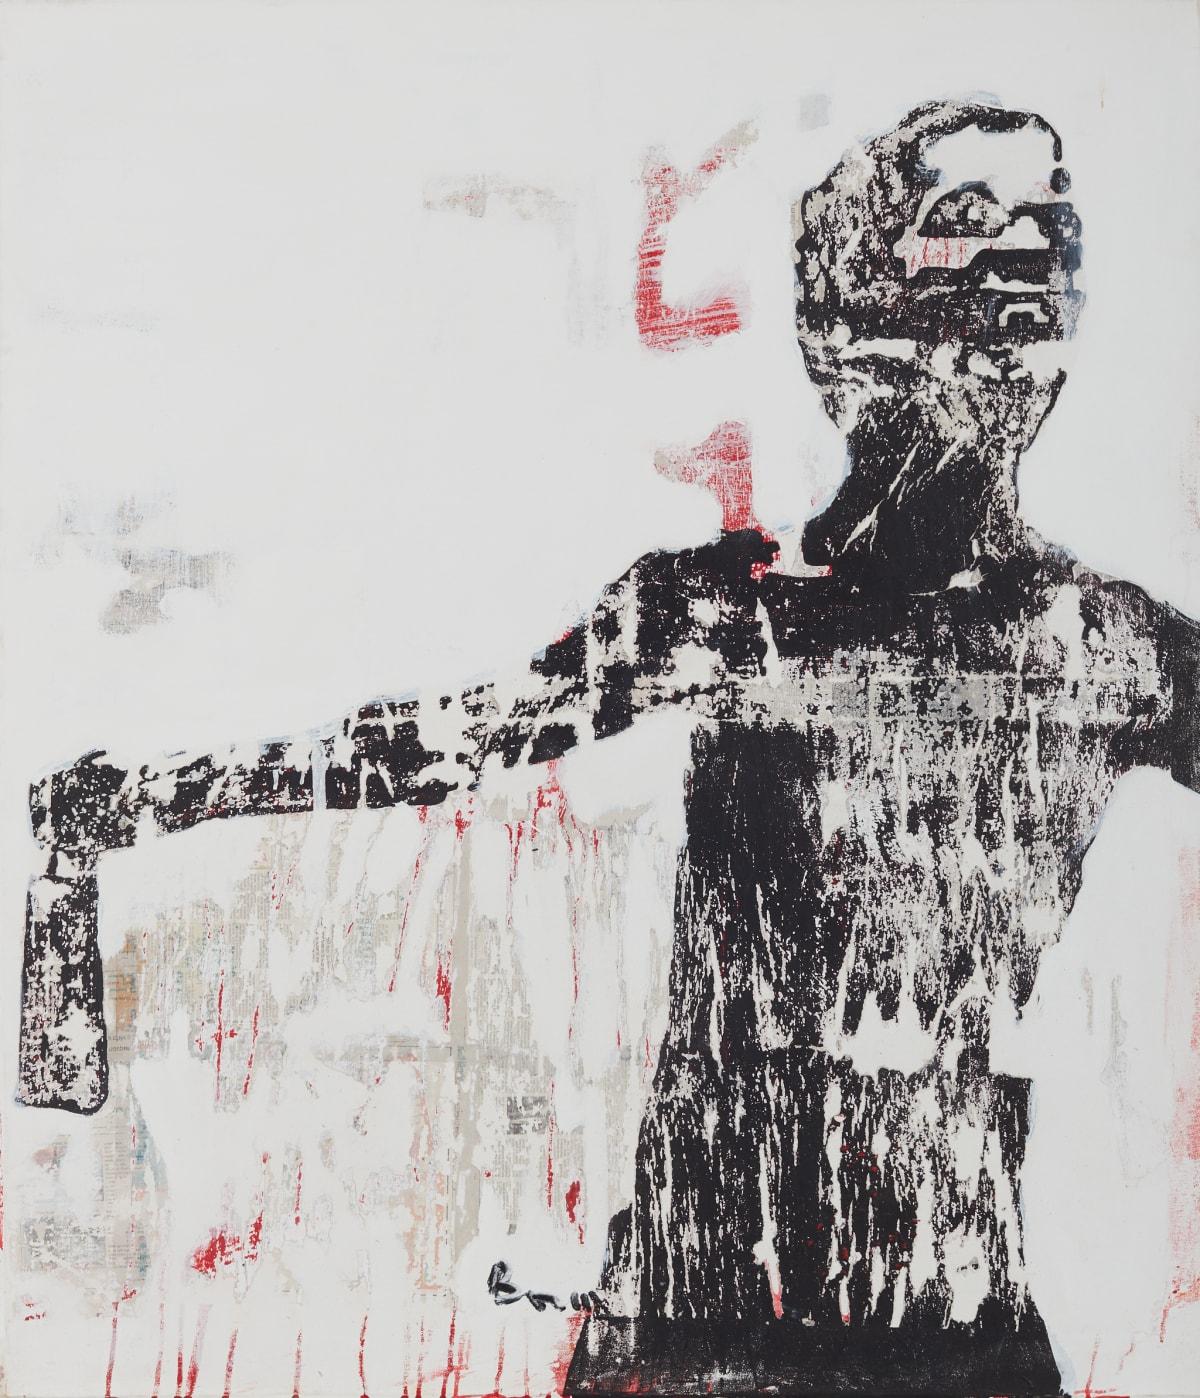 Armand Boua, Enjailler, 2019